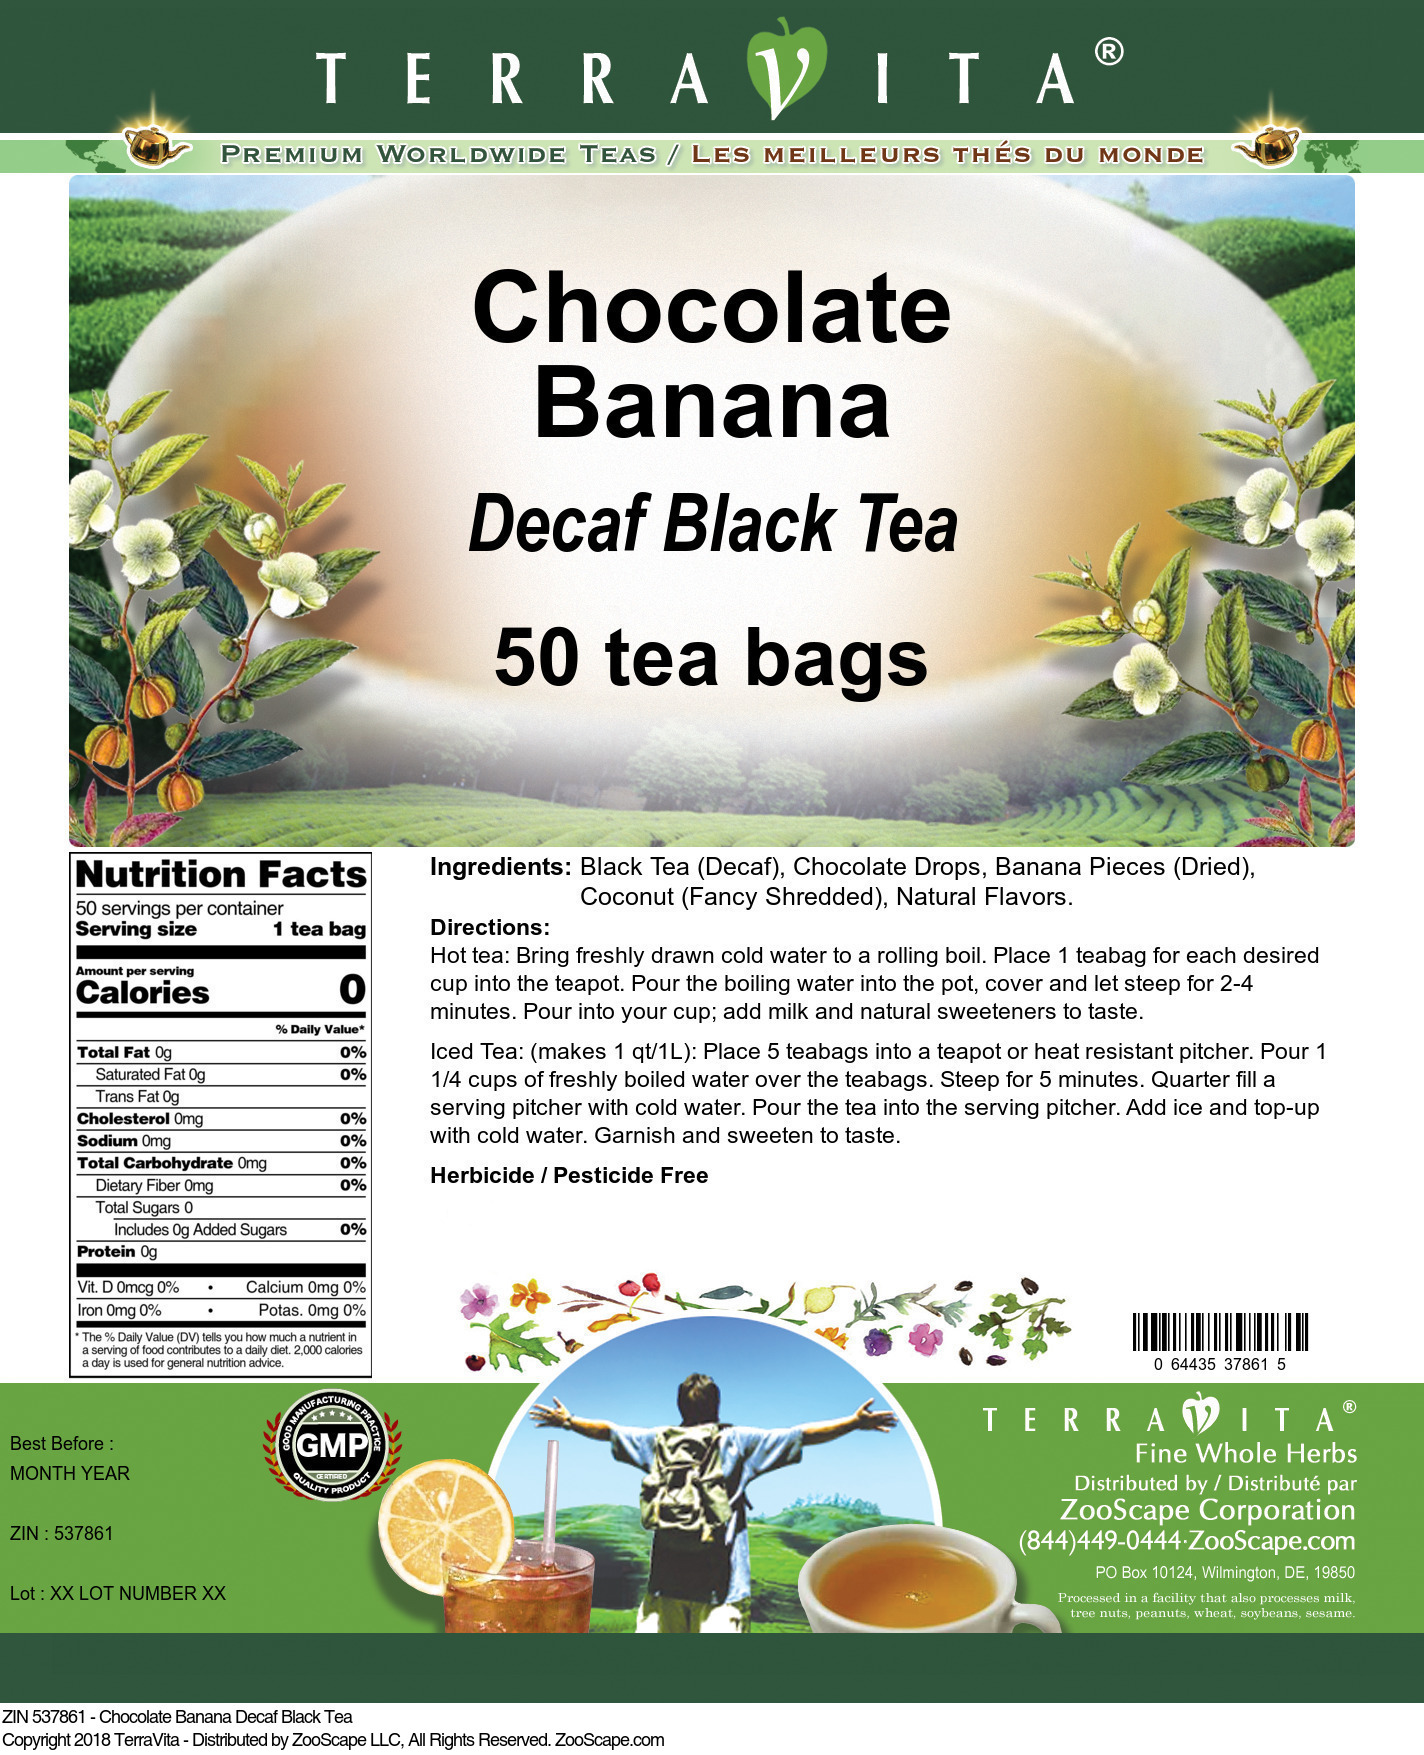 Chocolate Banana Decaf Black Tea